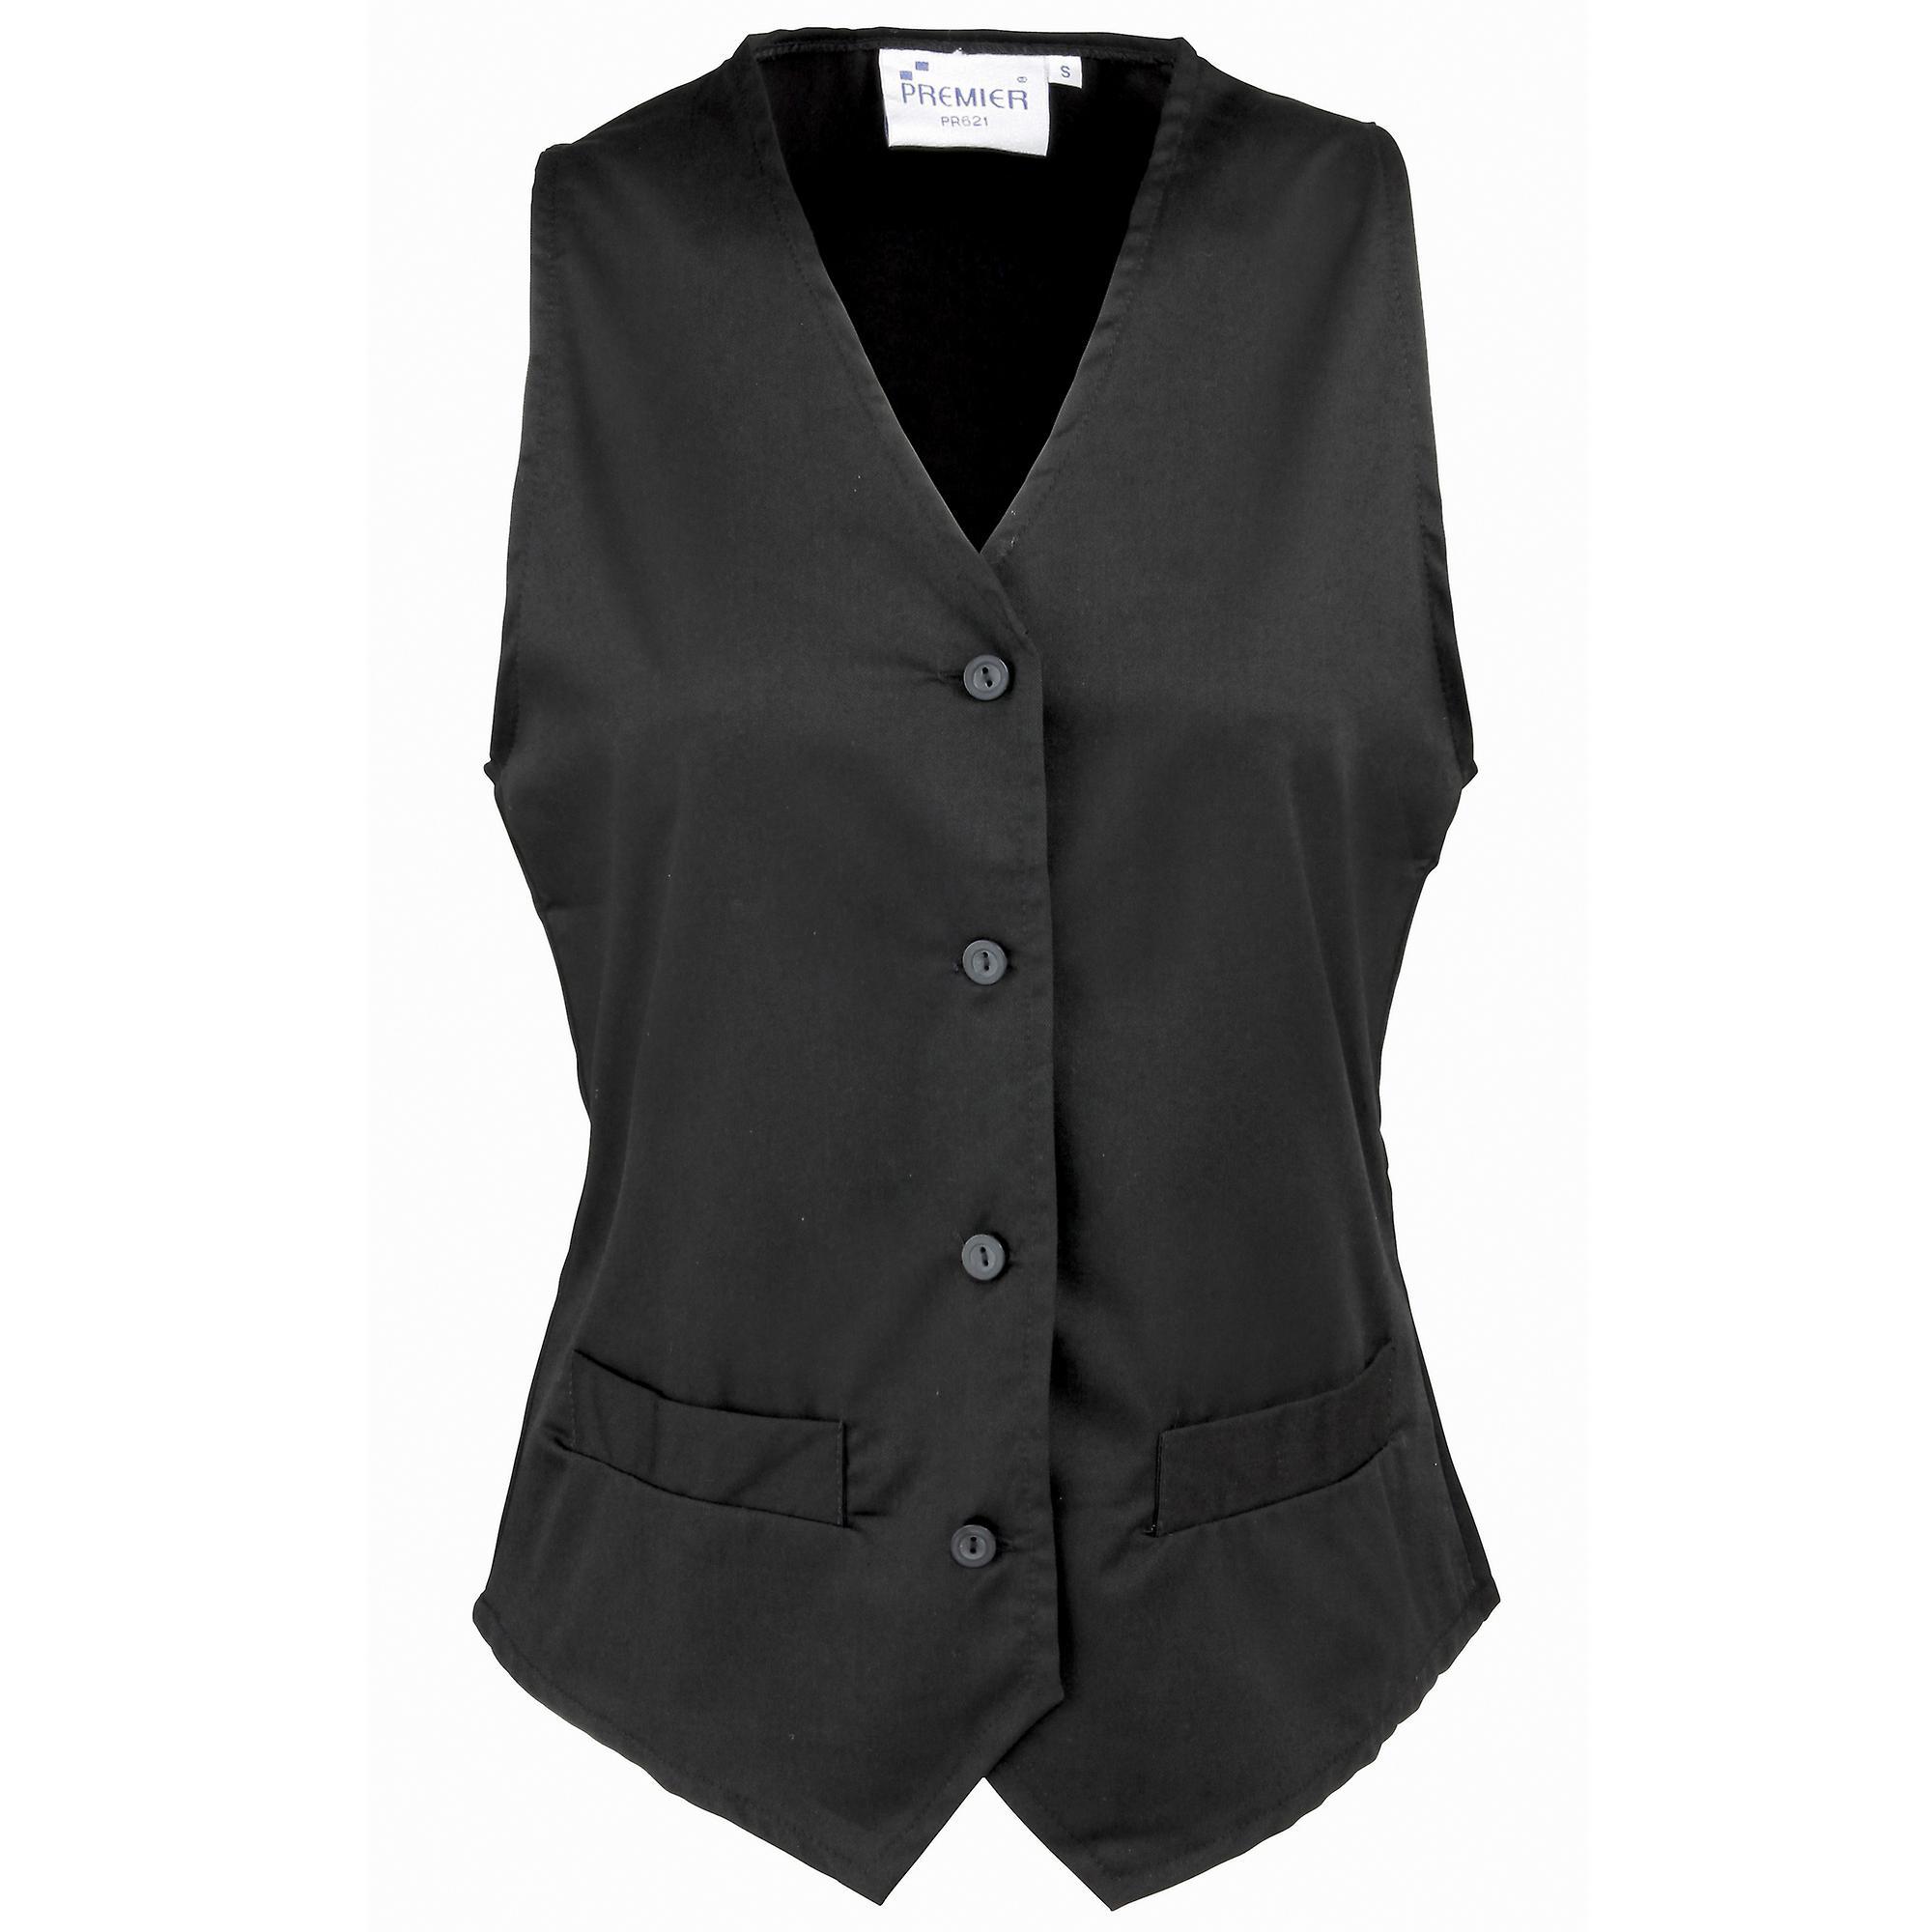 Premier Womens/Ladies Hospitality Waistcoat / Catering / Barwear